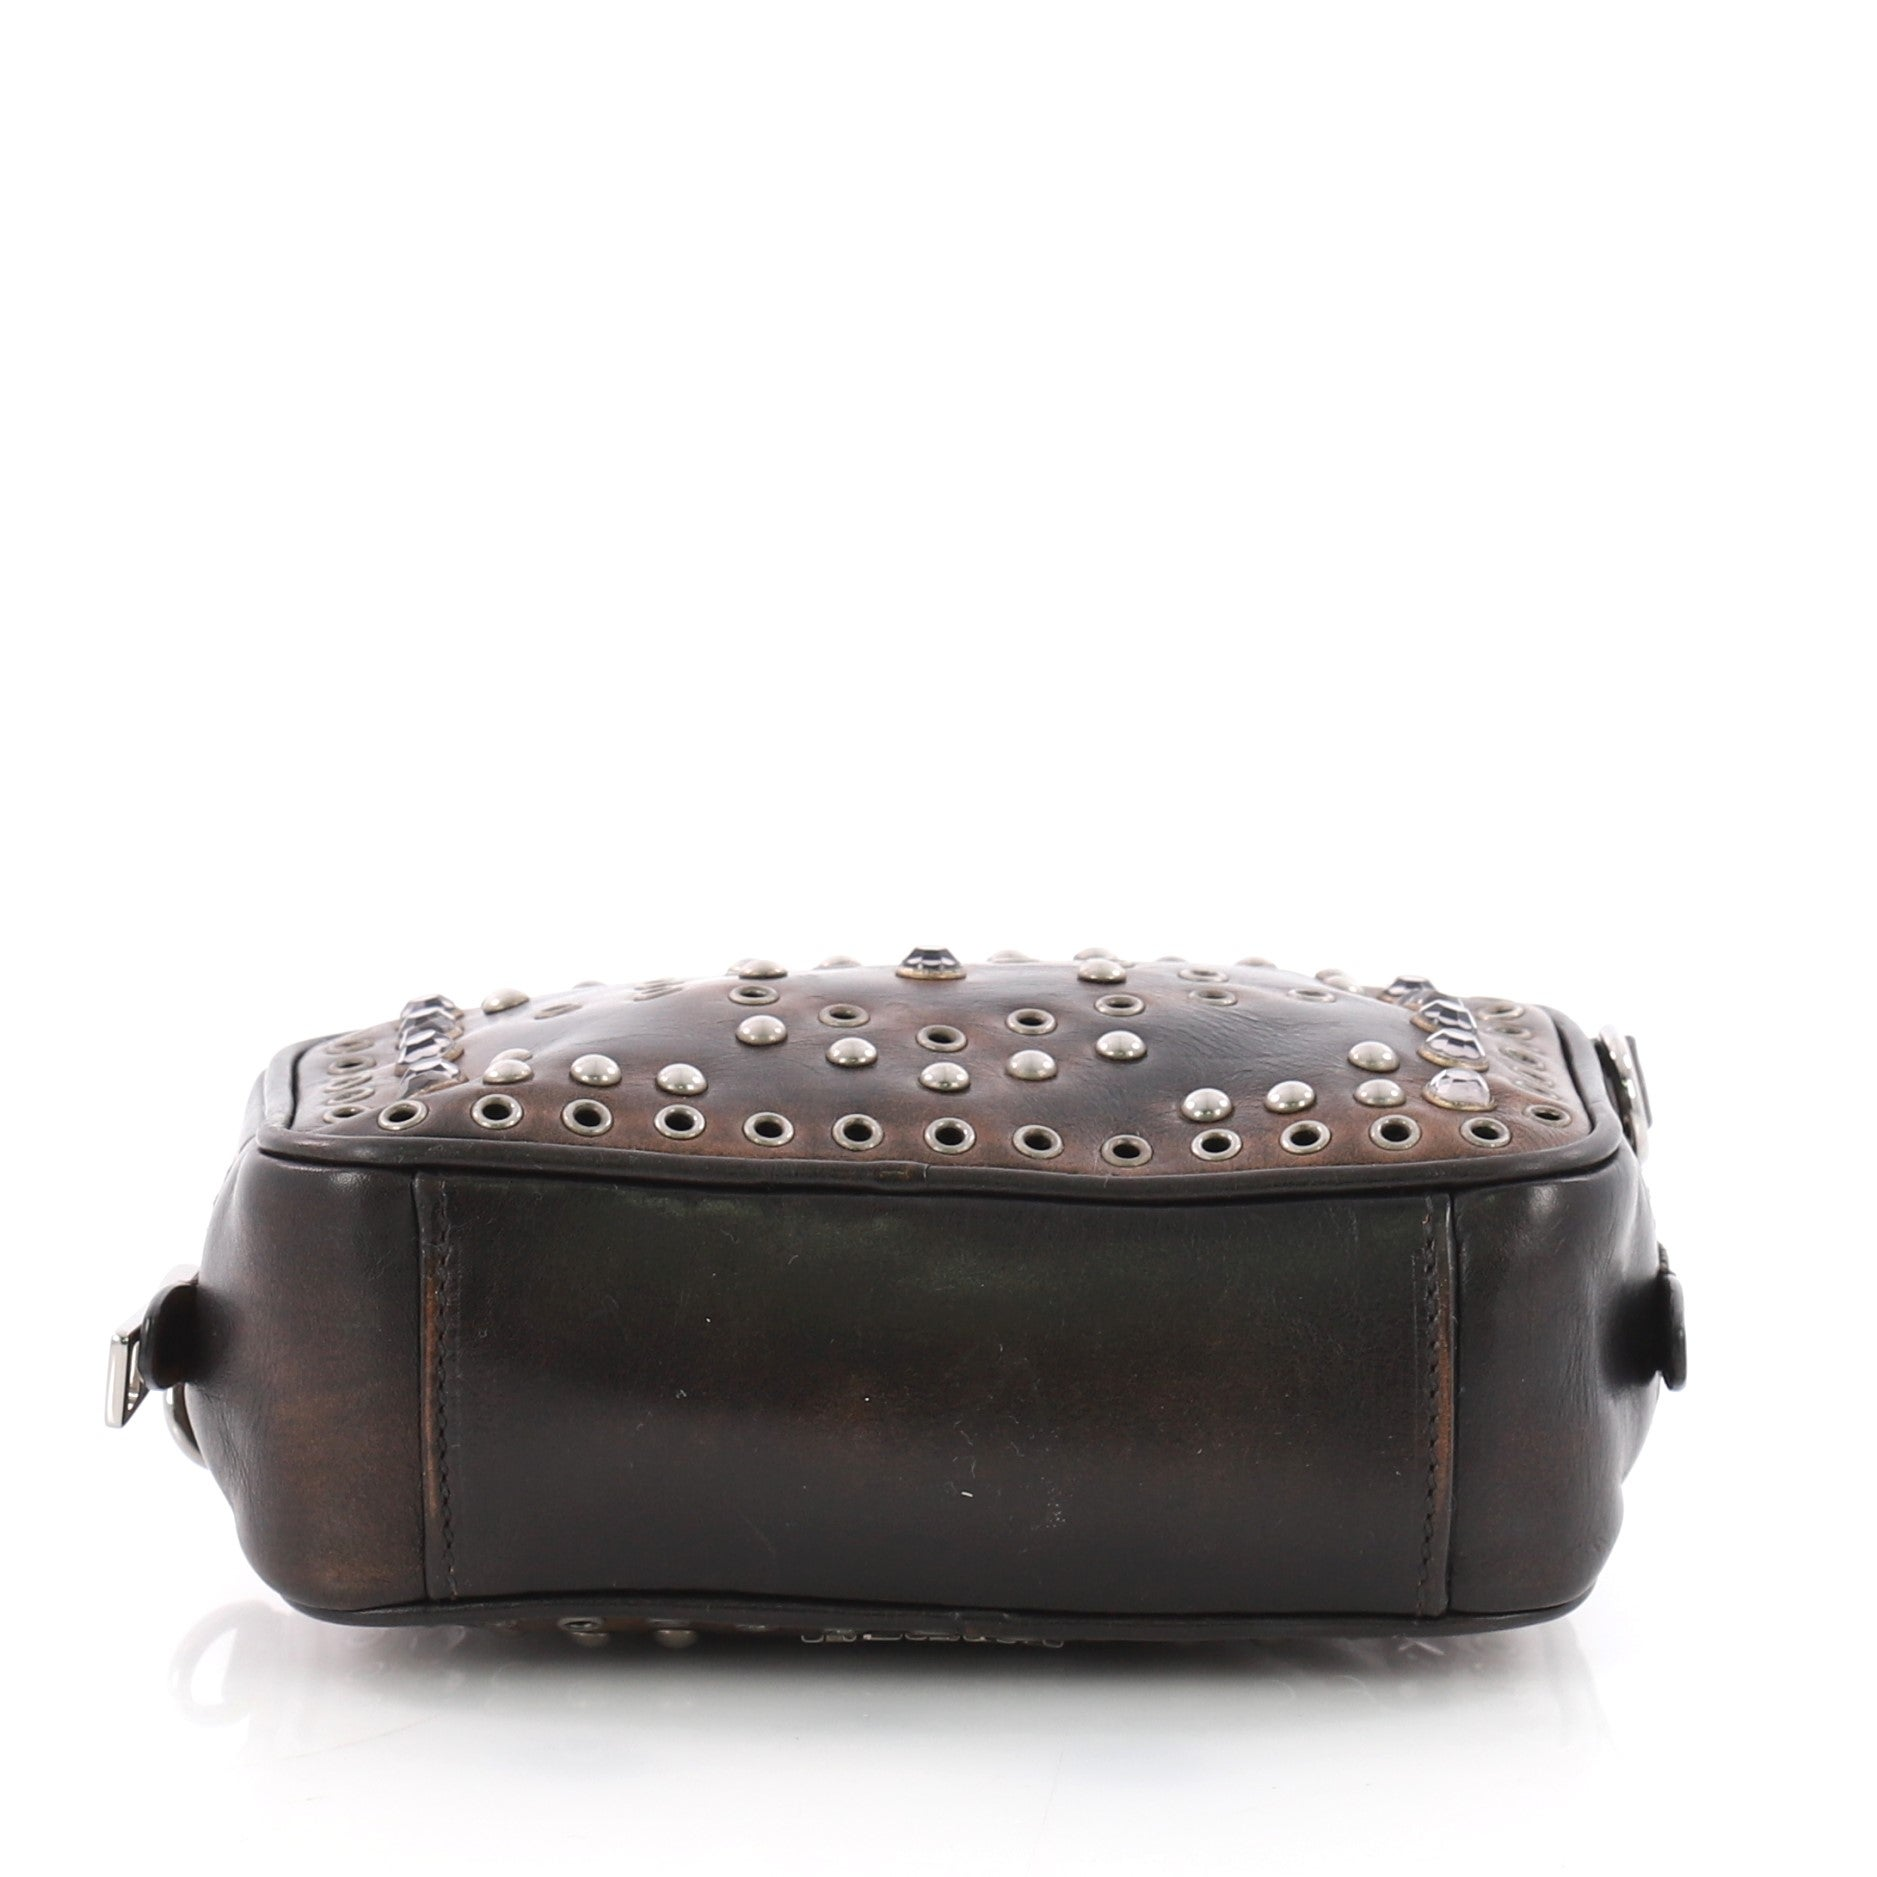 d19cd2f4a84a Prada Zip Crossbody Bag Studded Vitello Vintage Mini at 1stdibs